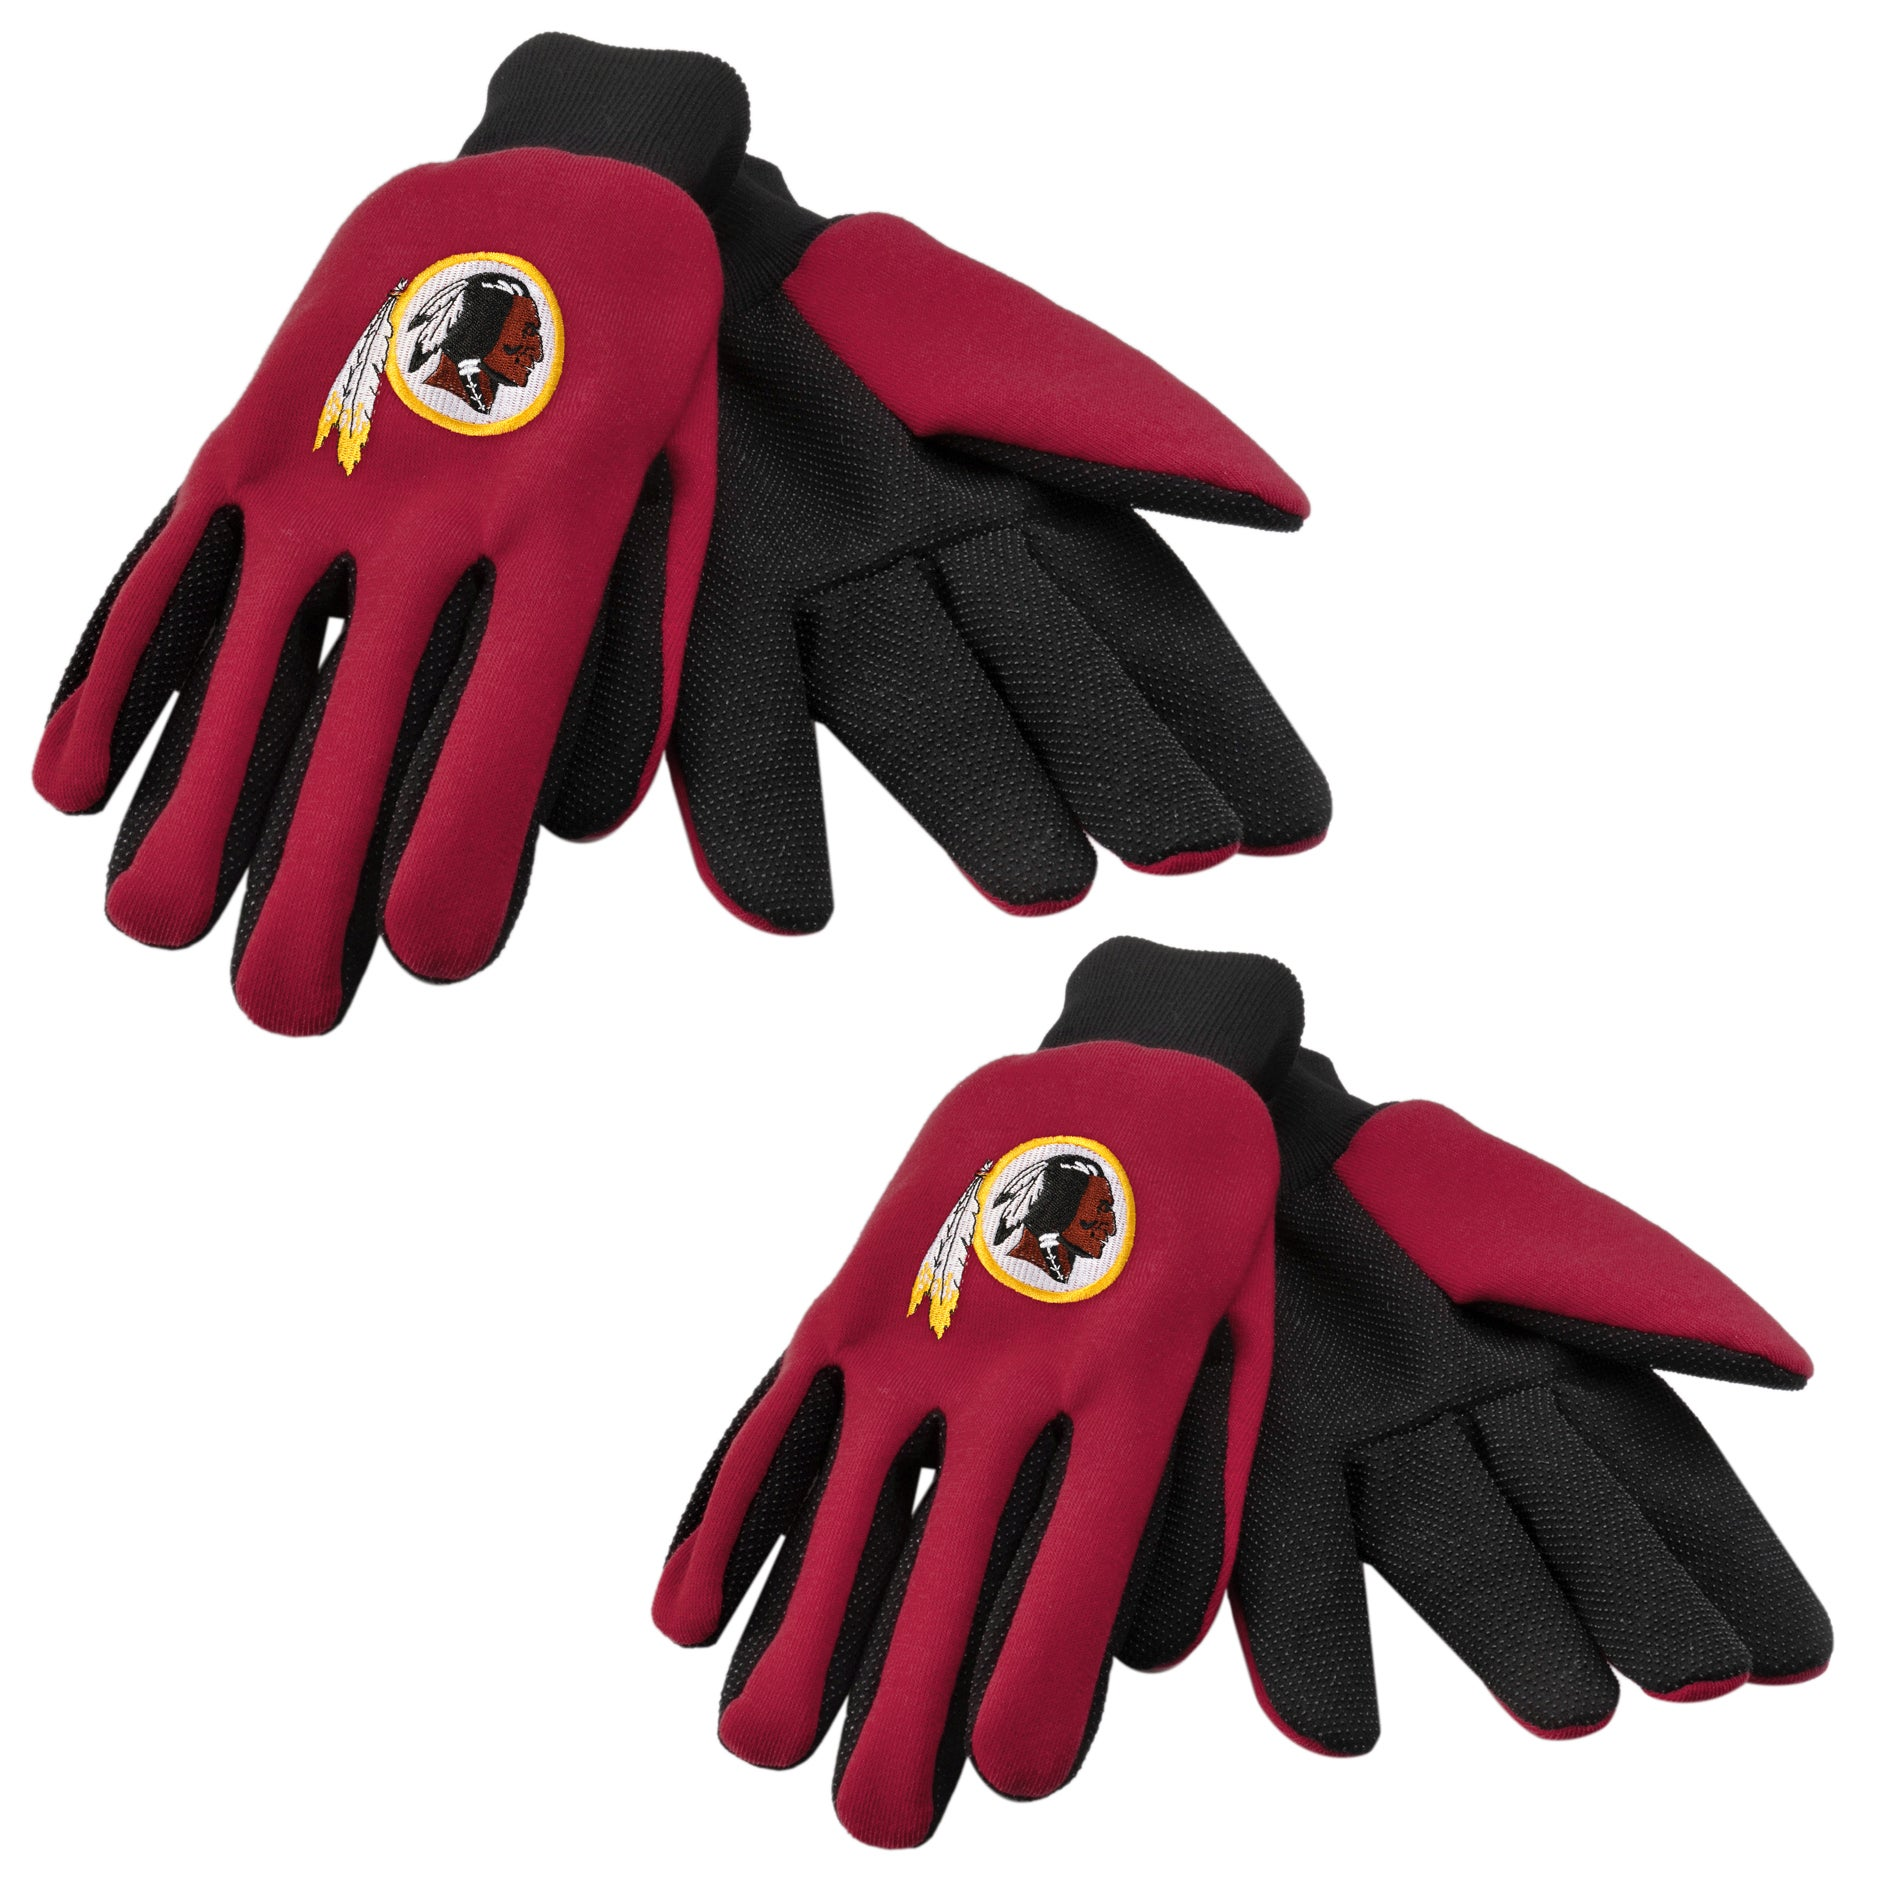 Washington Redskins Two-tone Gloves (Set of 2 Pair)